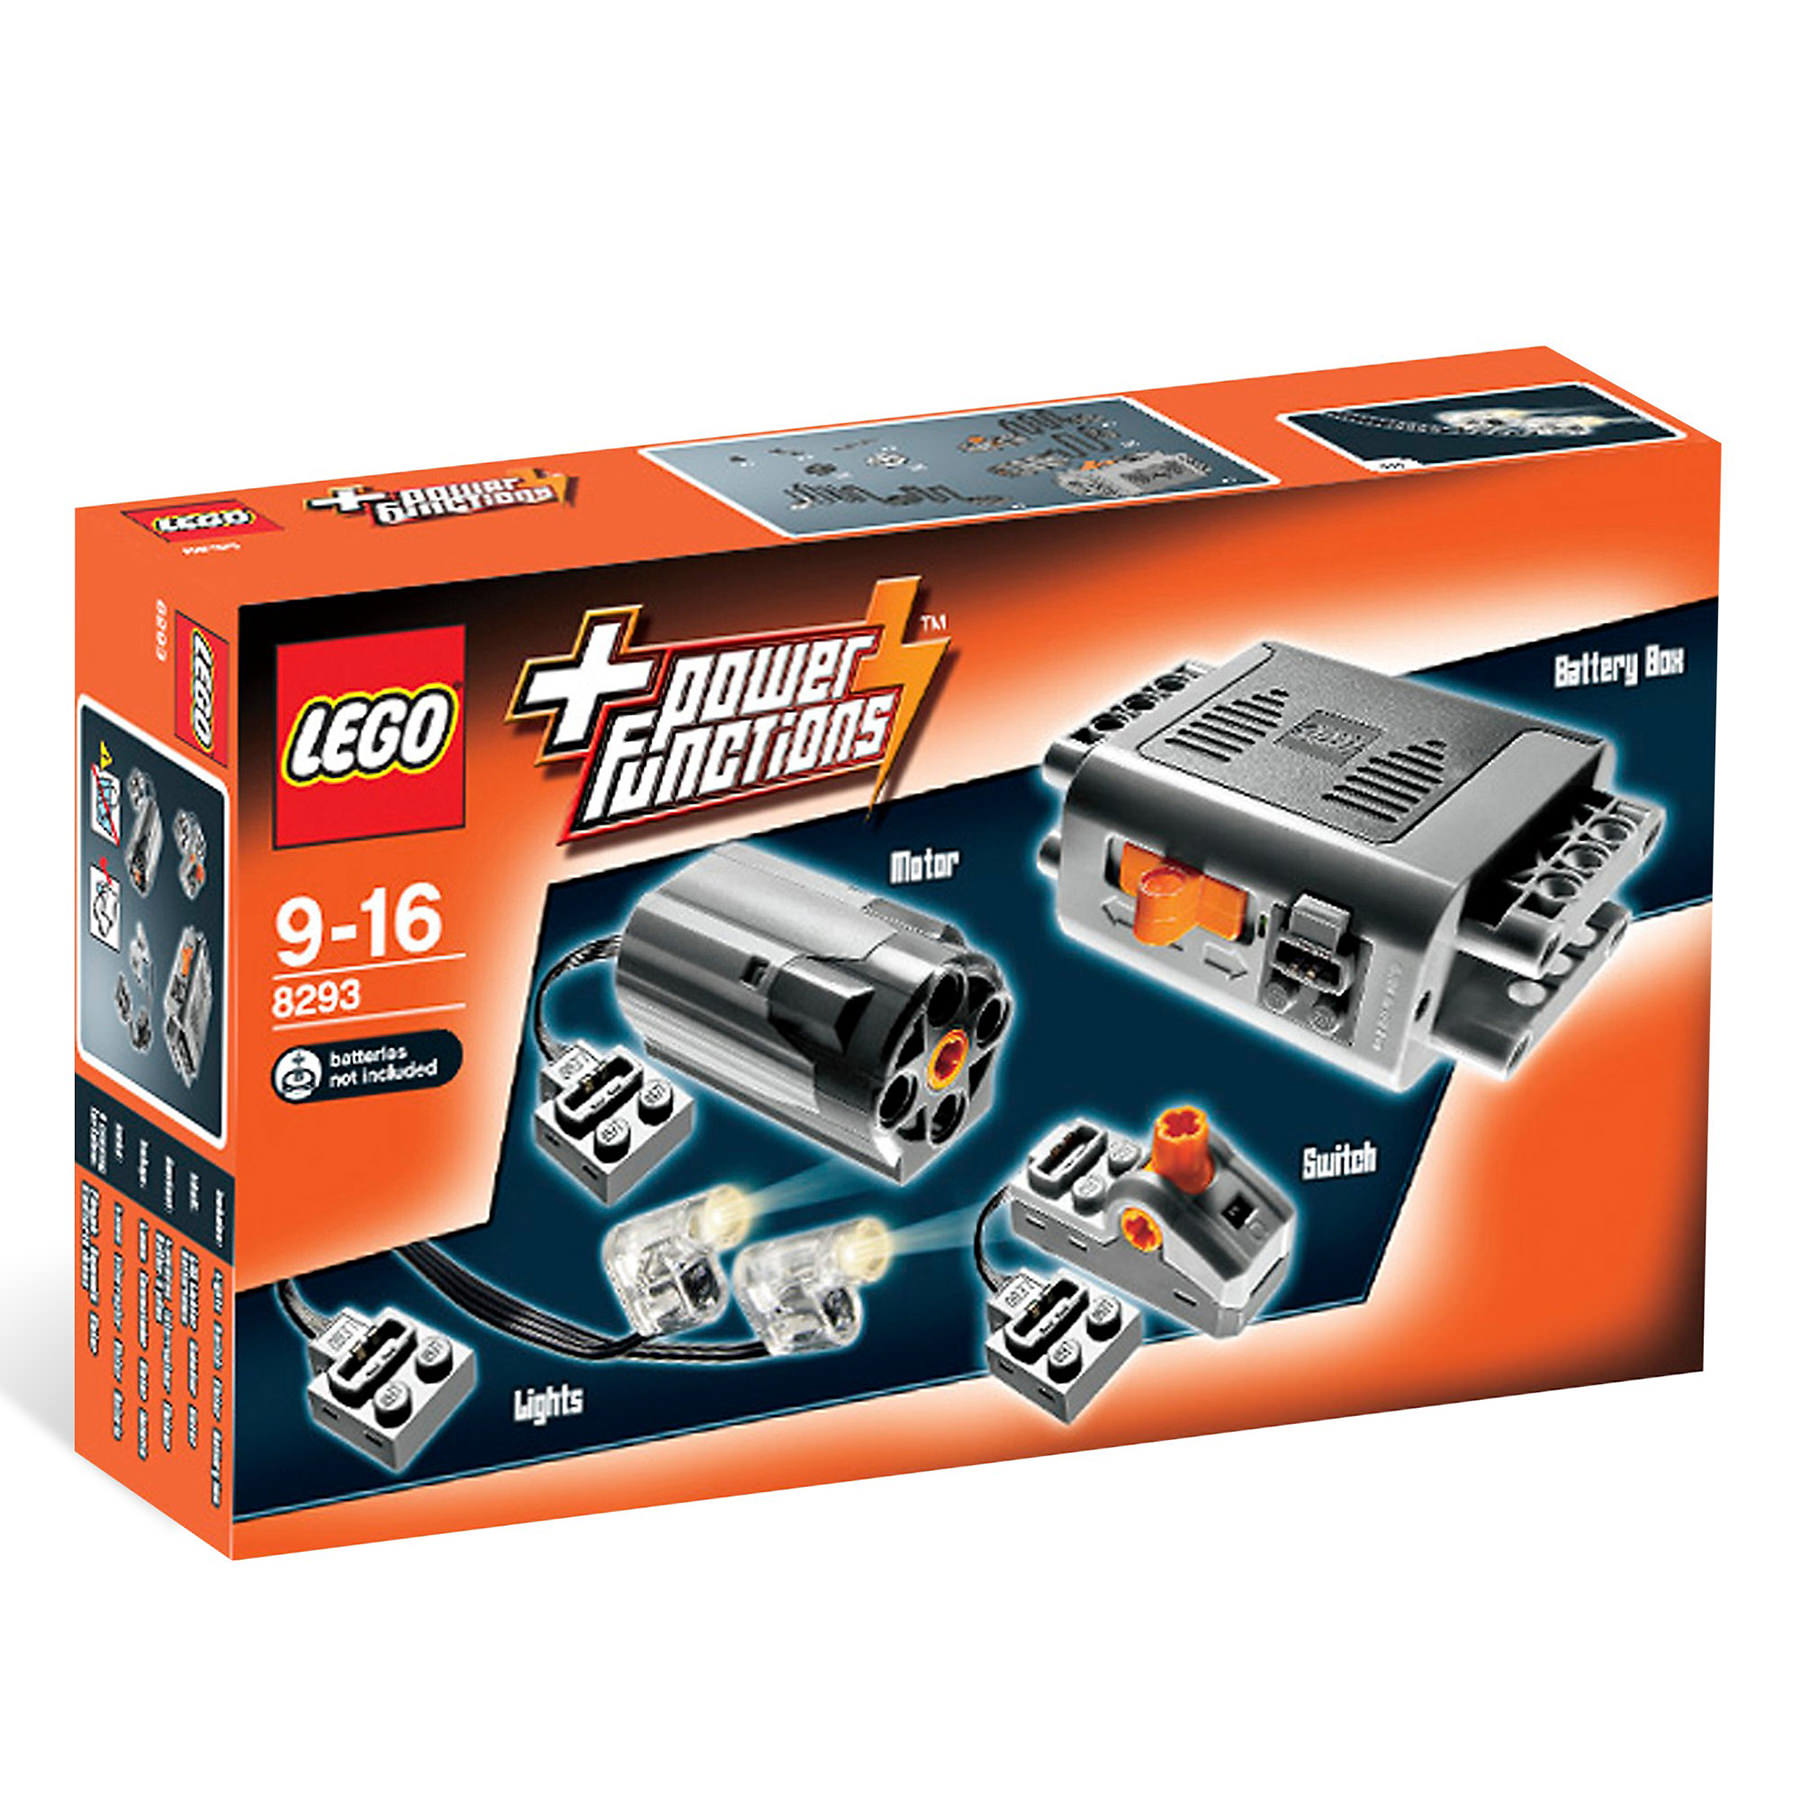 LEGO 8293 Power Functions Motor Set At Hobby Warehouse